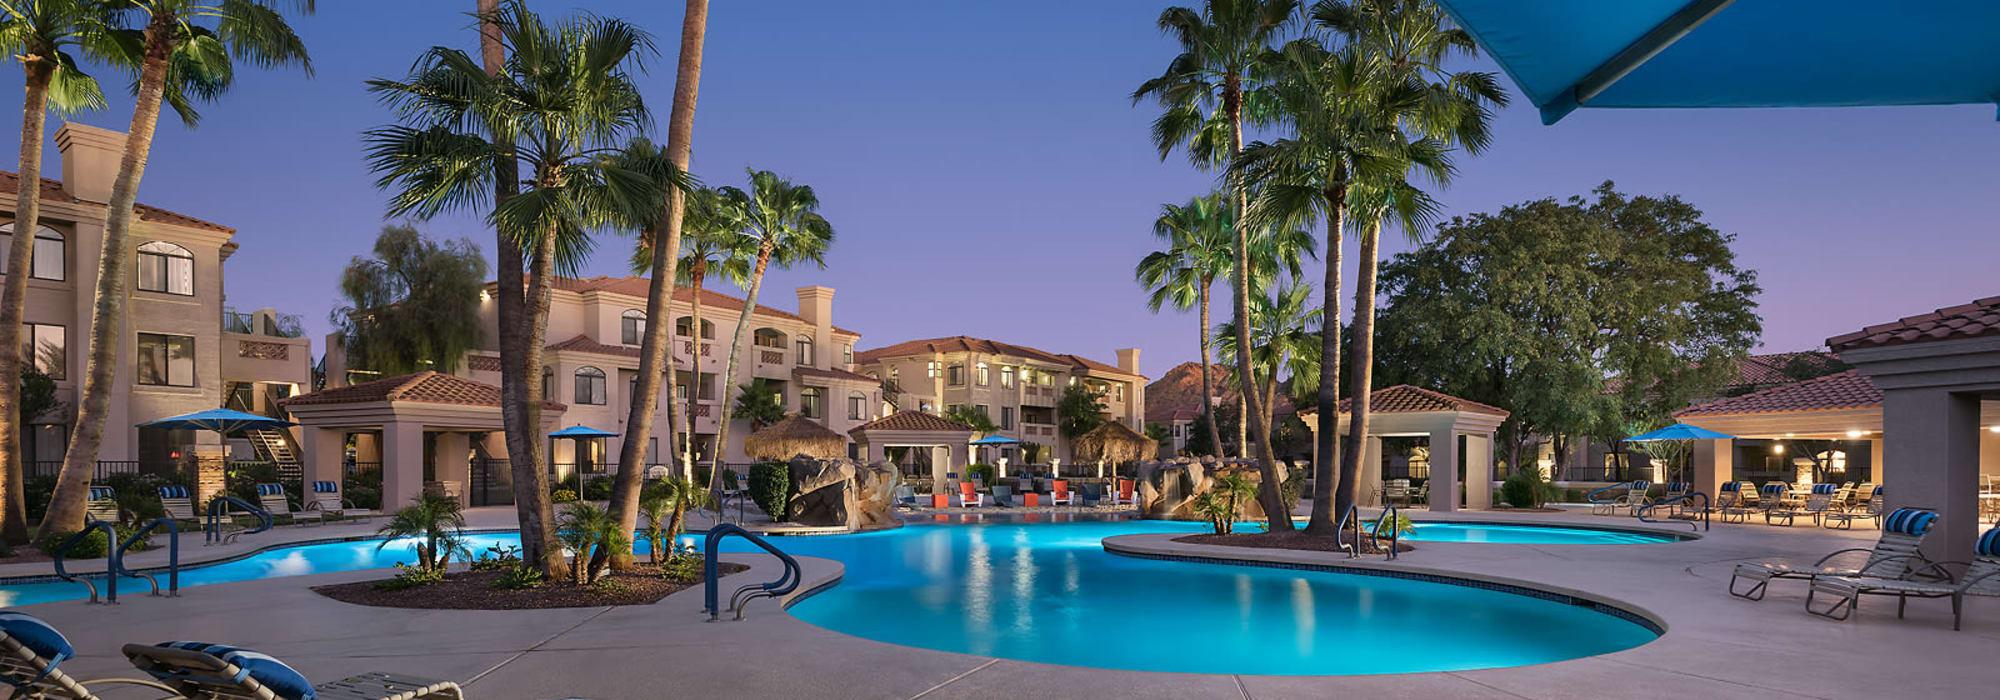 Gorgeous swimming pool area at San Pedregal in Phoenix, Arizona